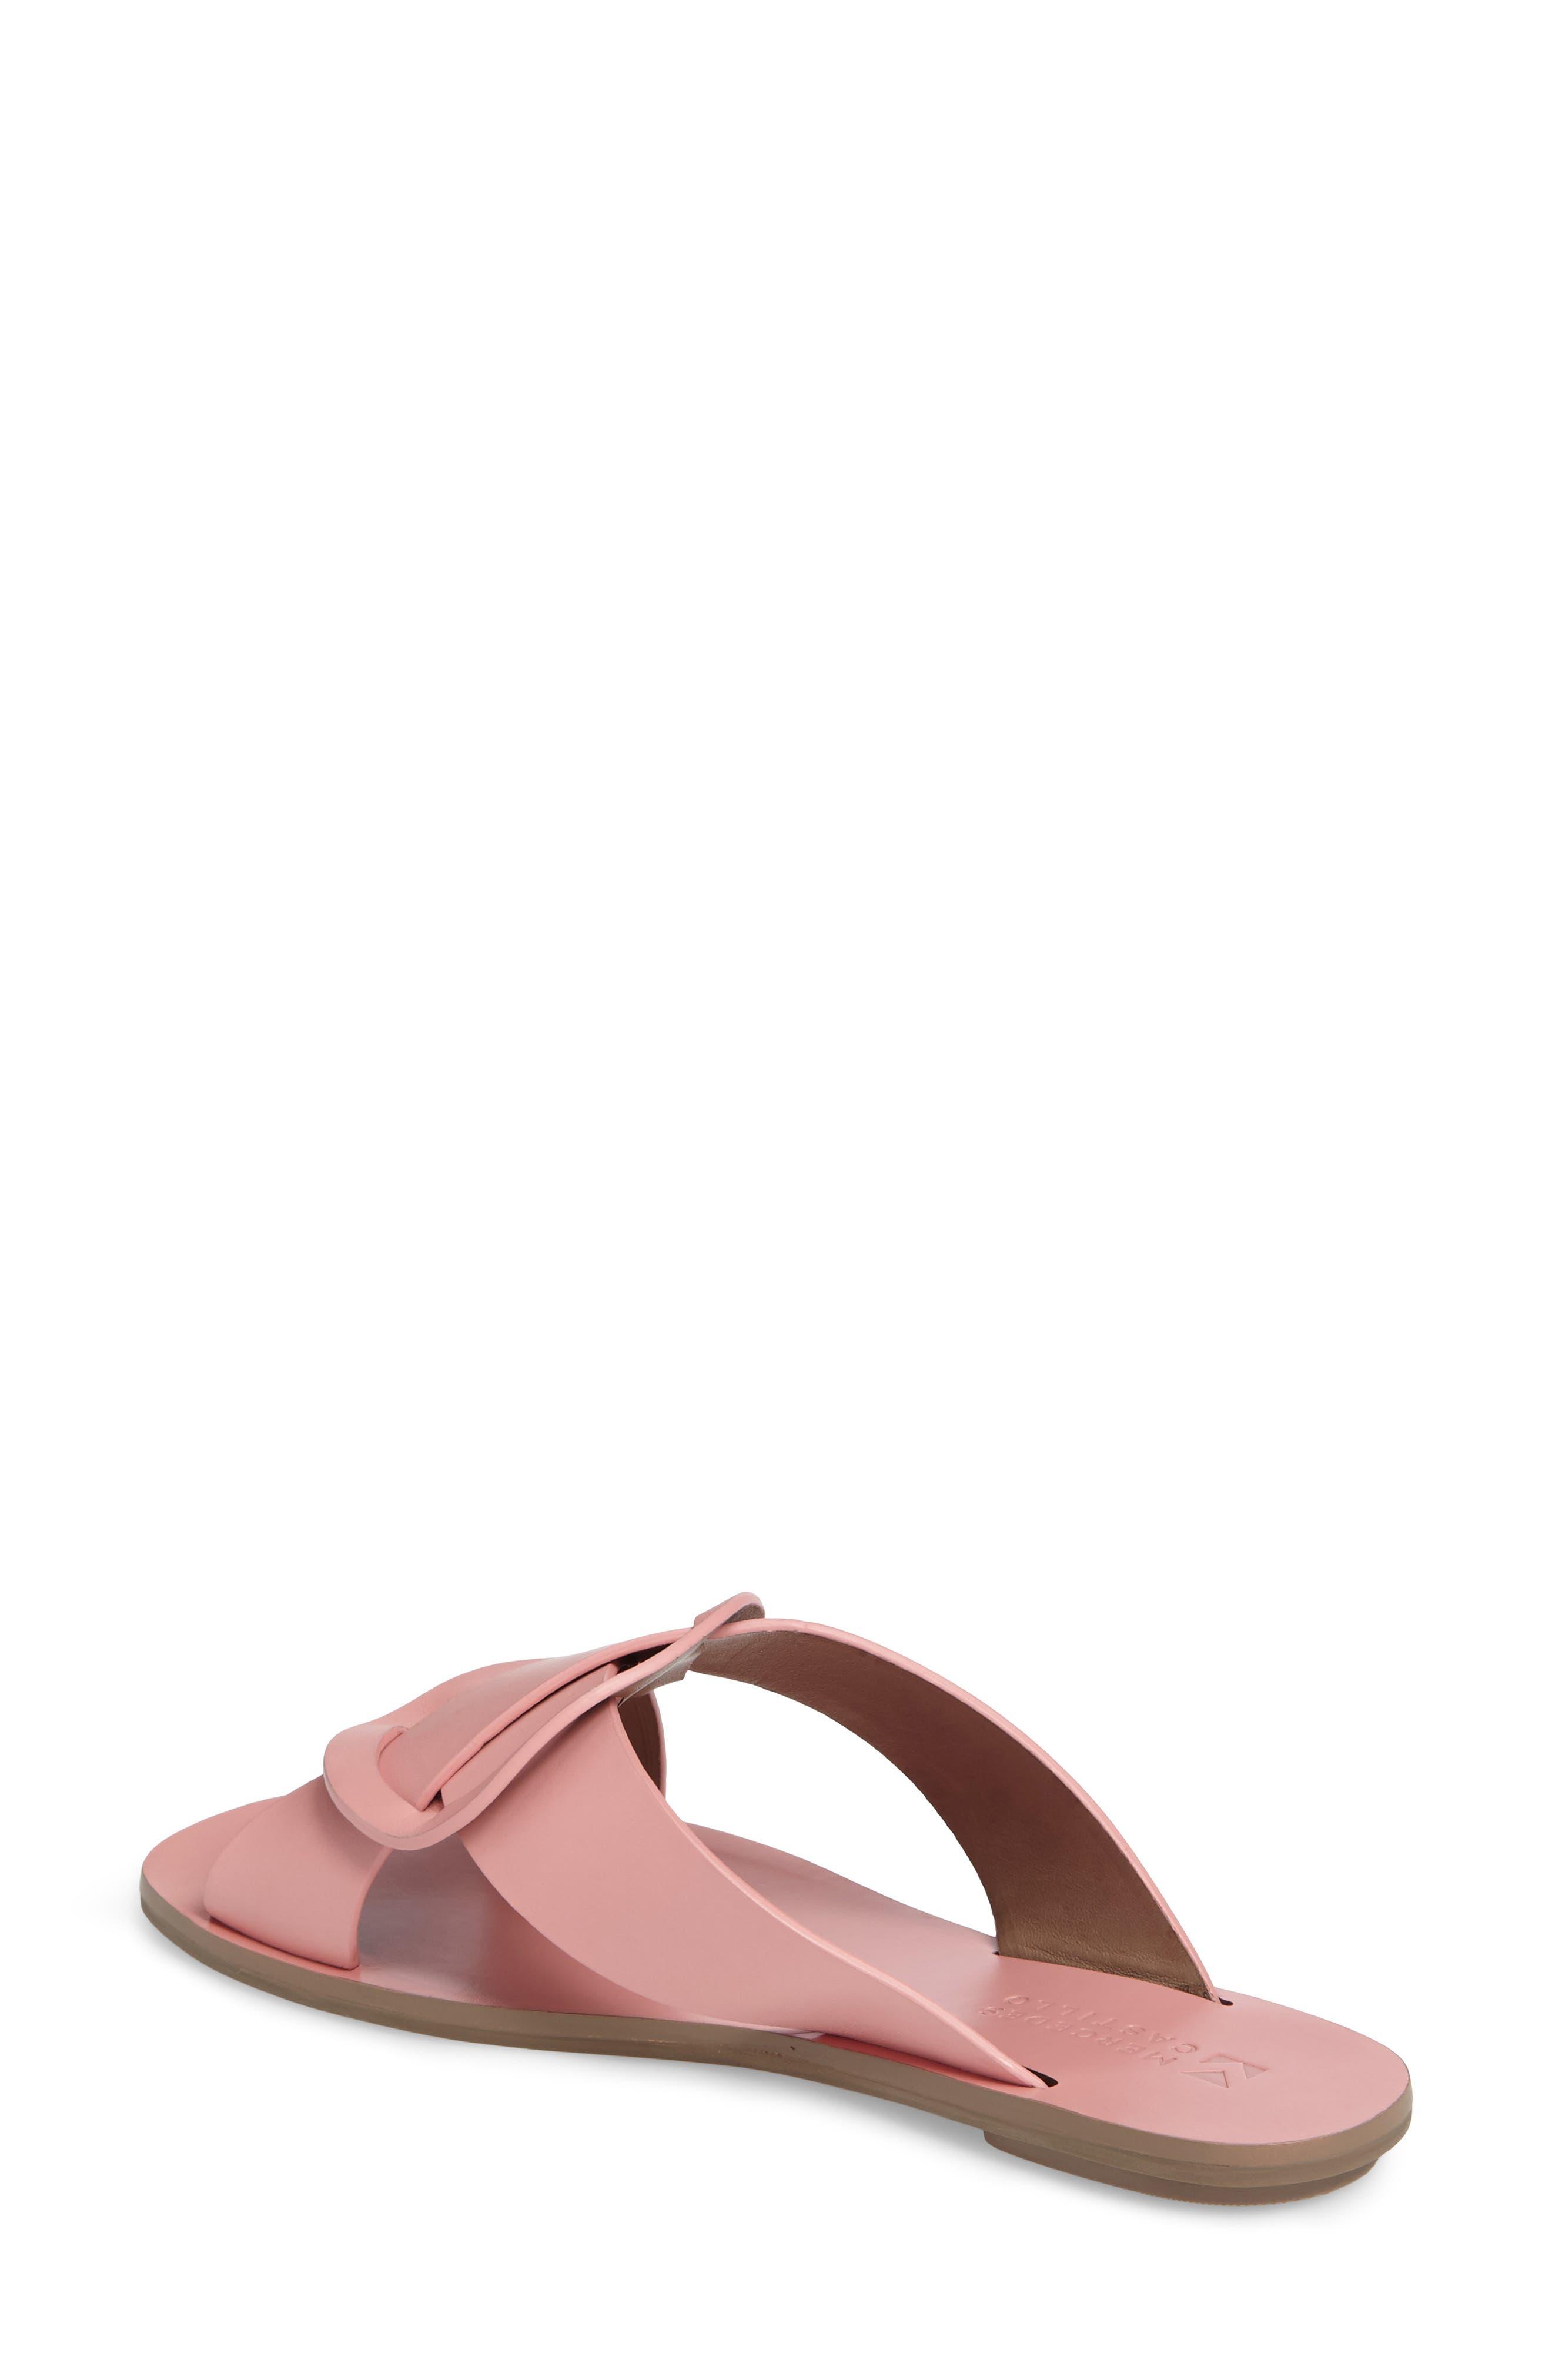 Carlein Slide Sandal,                             Alternate thumbnail 3, color,                             Pink Peony Leather